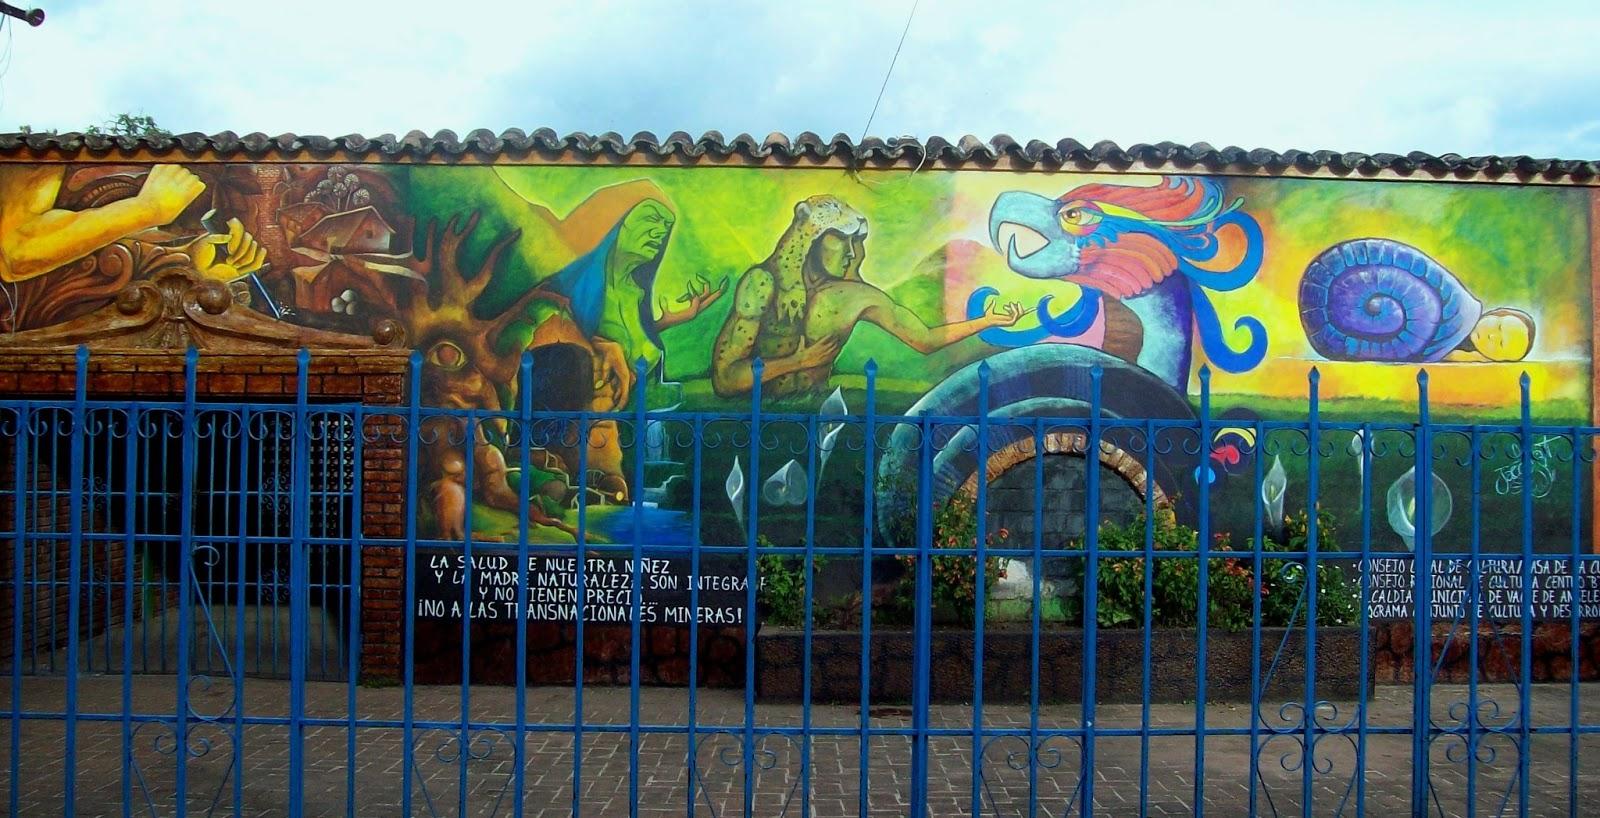 Javier espinal mural colectivo valle de angeles for Arte colectivo mural